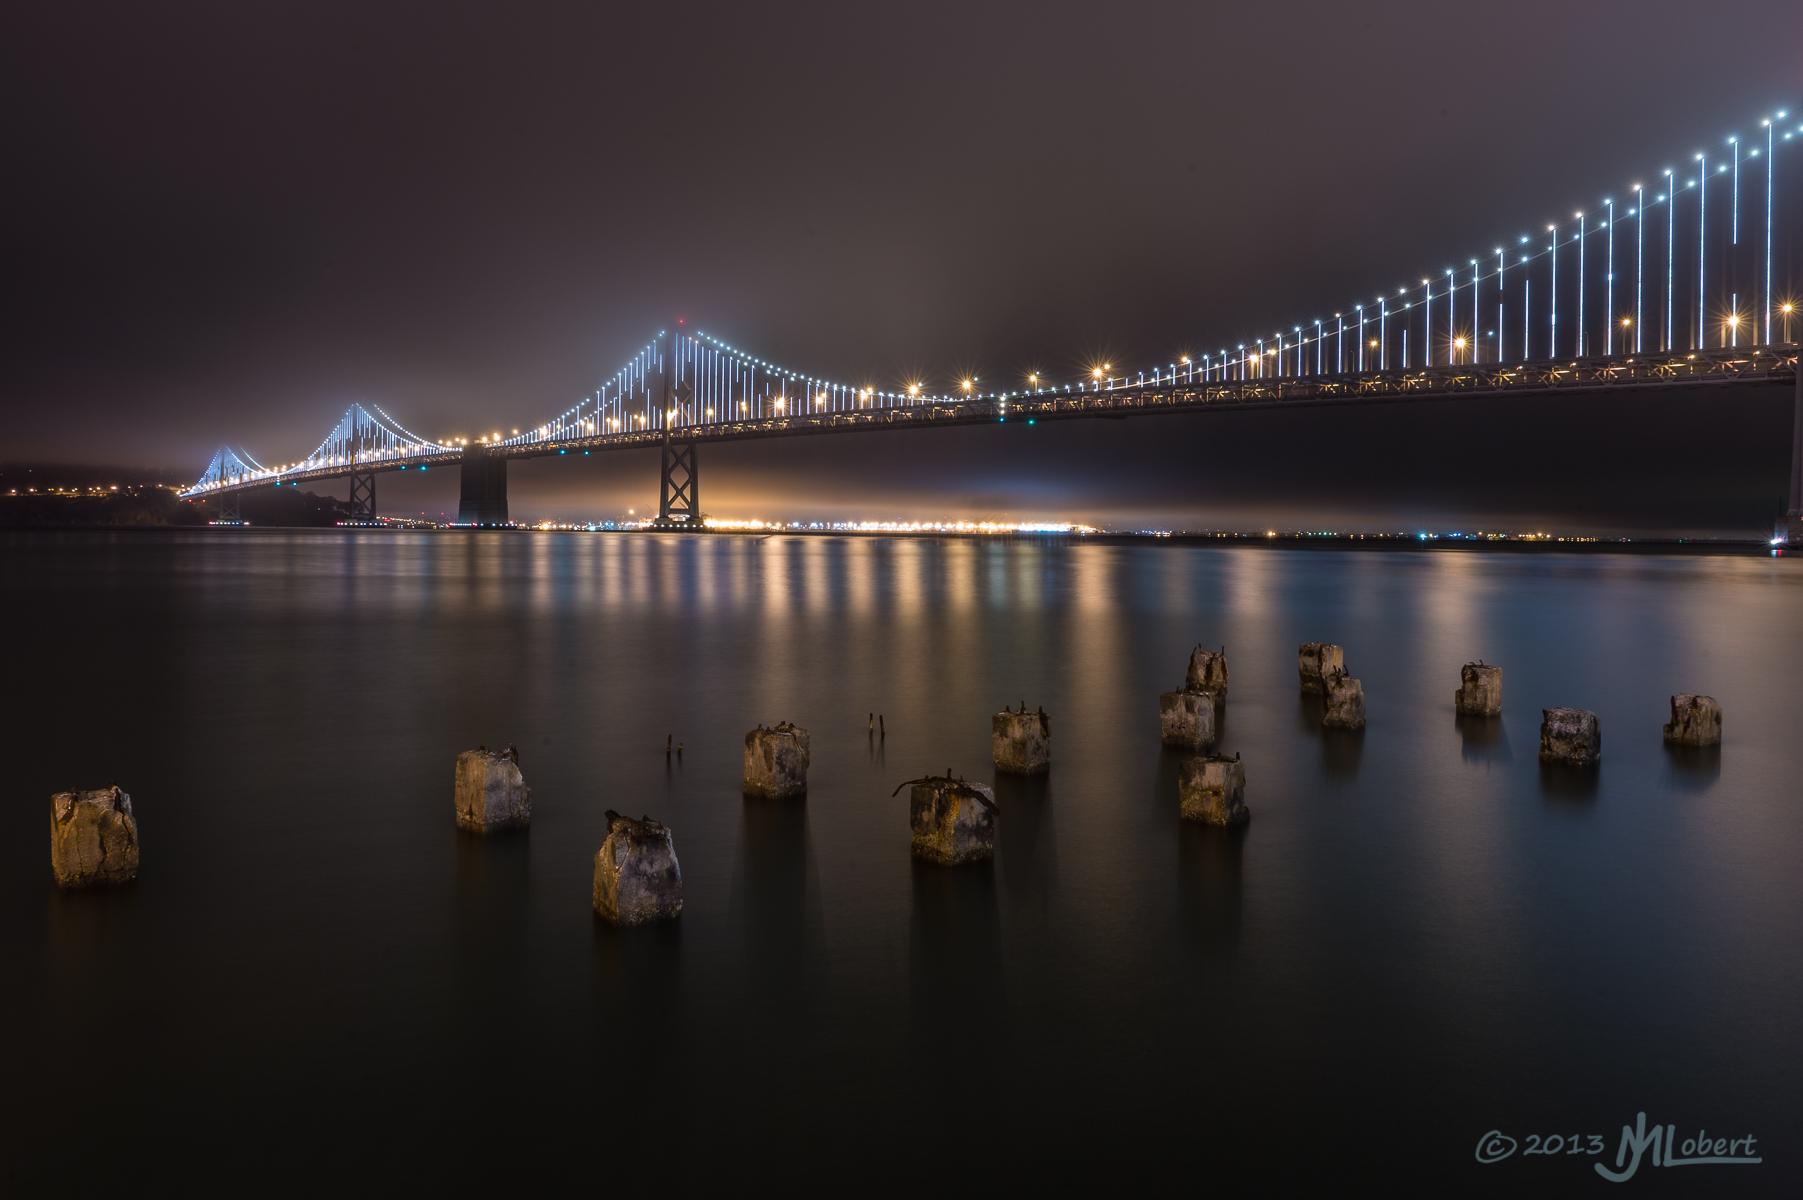 San Francisco Bay Bridge, Embarcadero, CA, USA